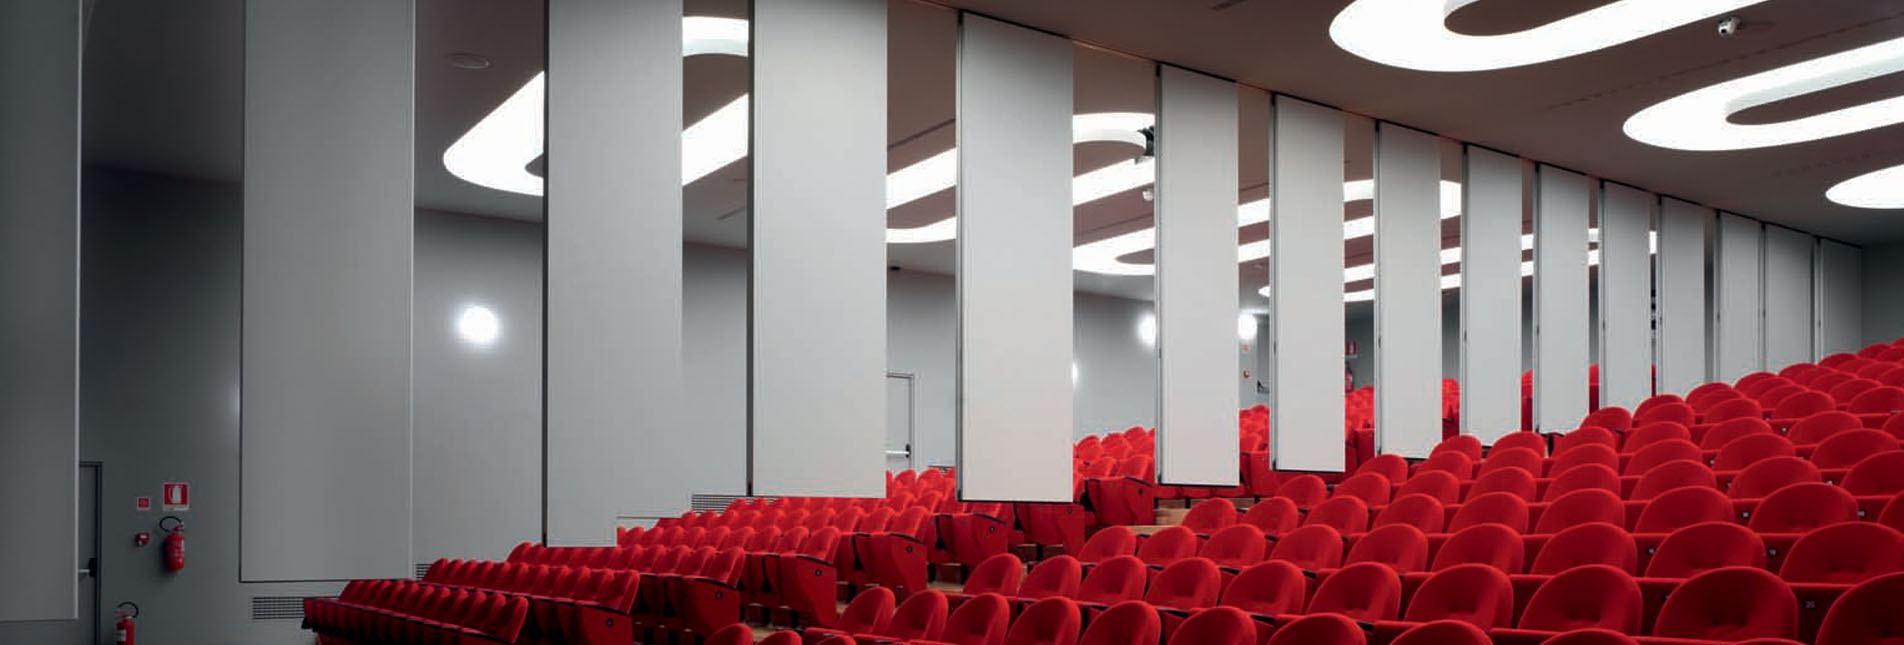 Konferans Salonu Hareketli Duvar Bölme Sistemi